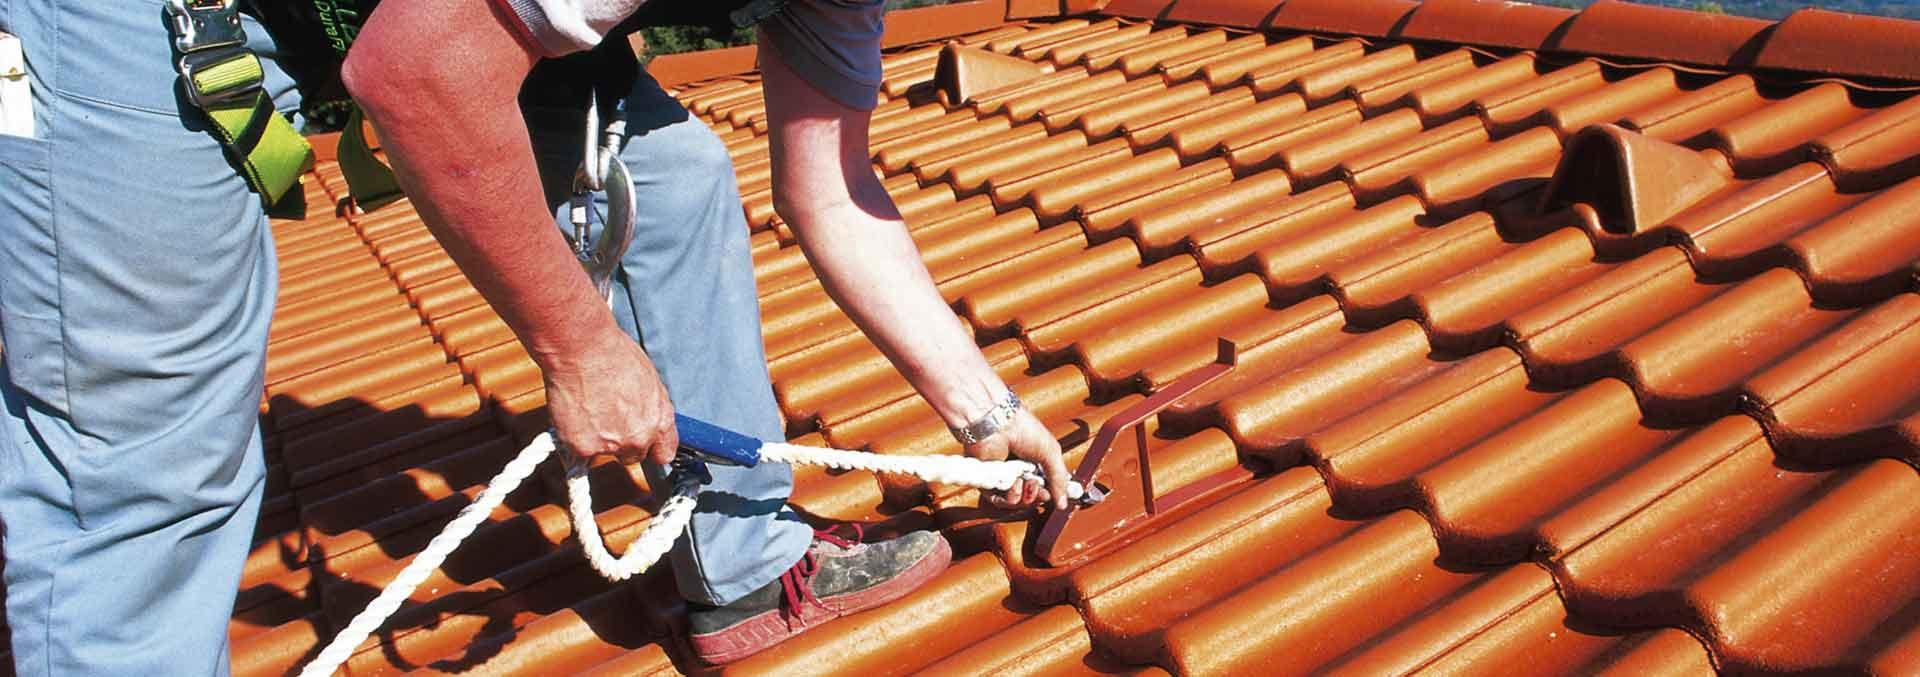 Ремонт на покривни конструкции